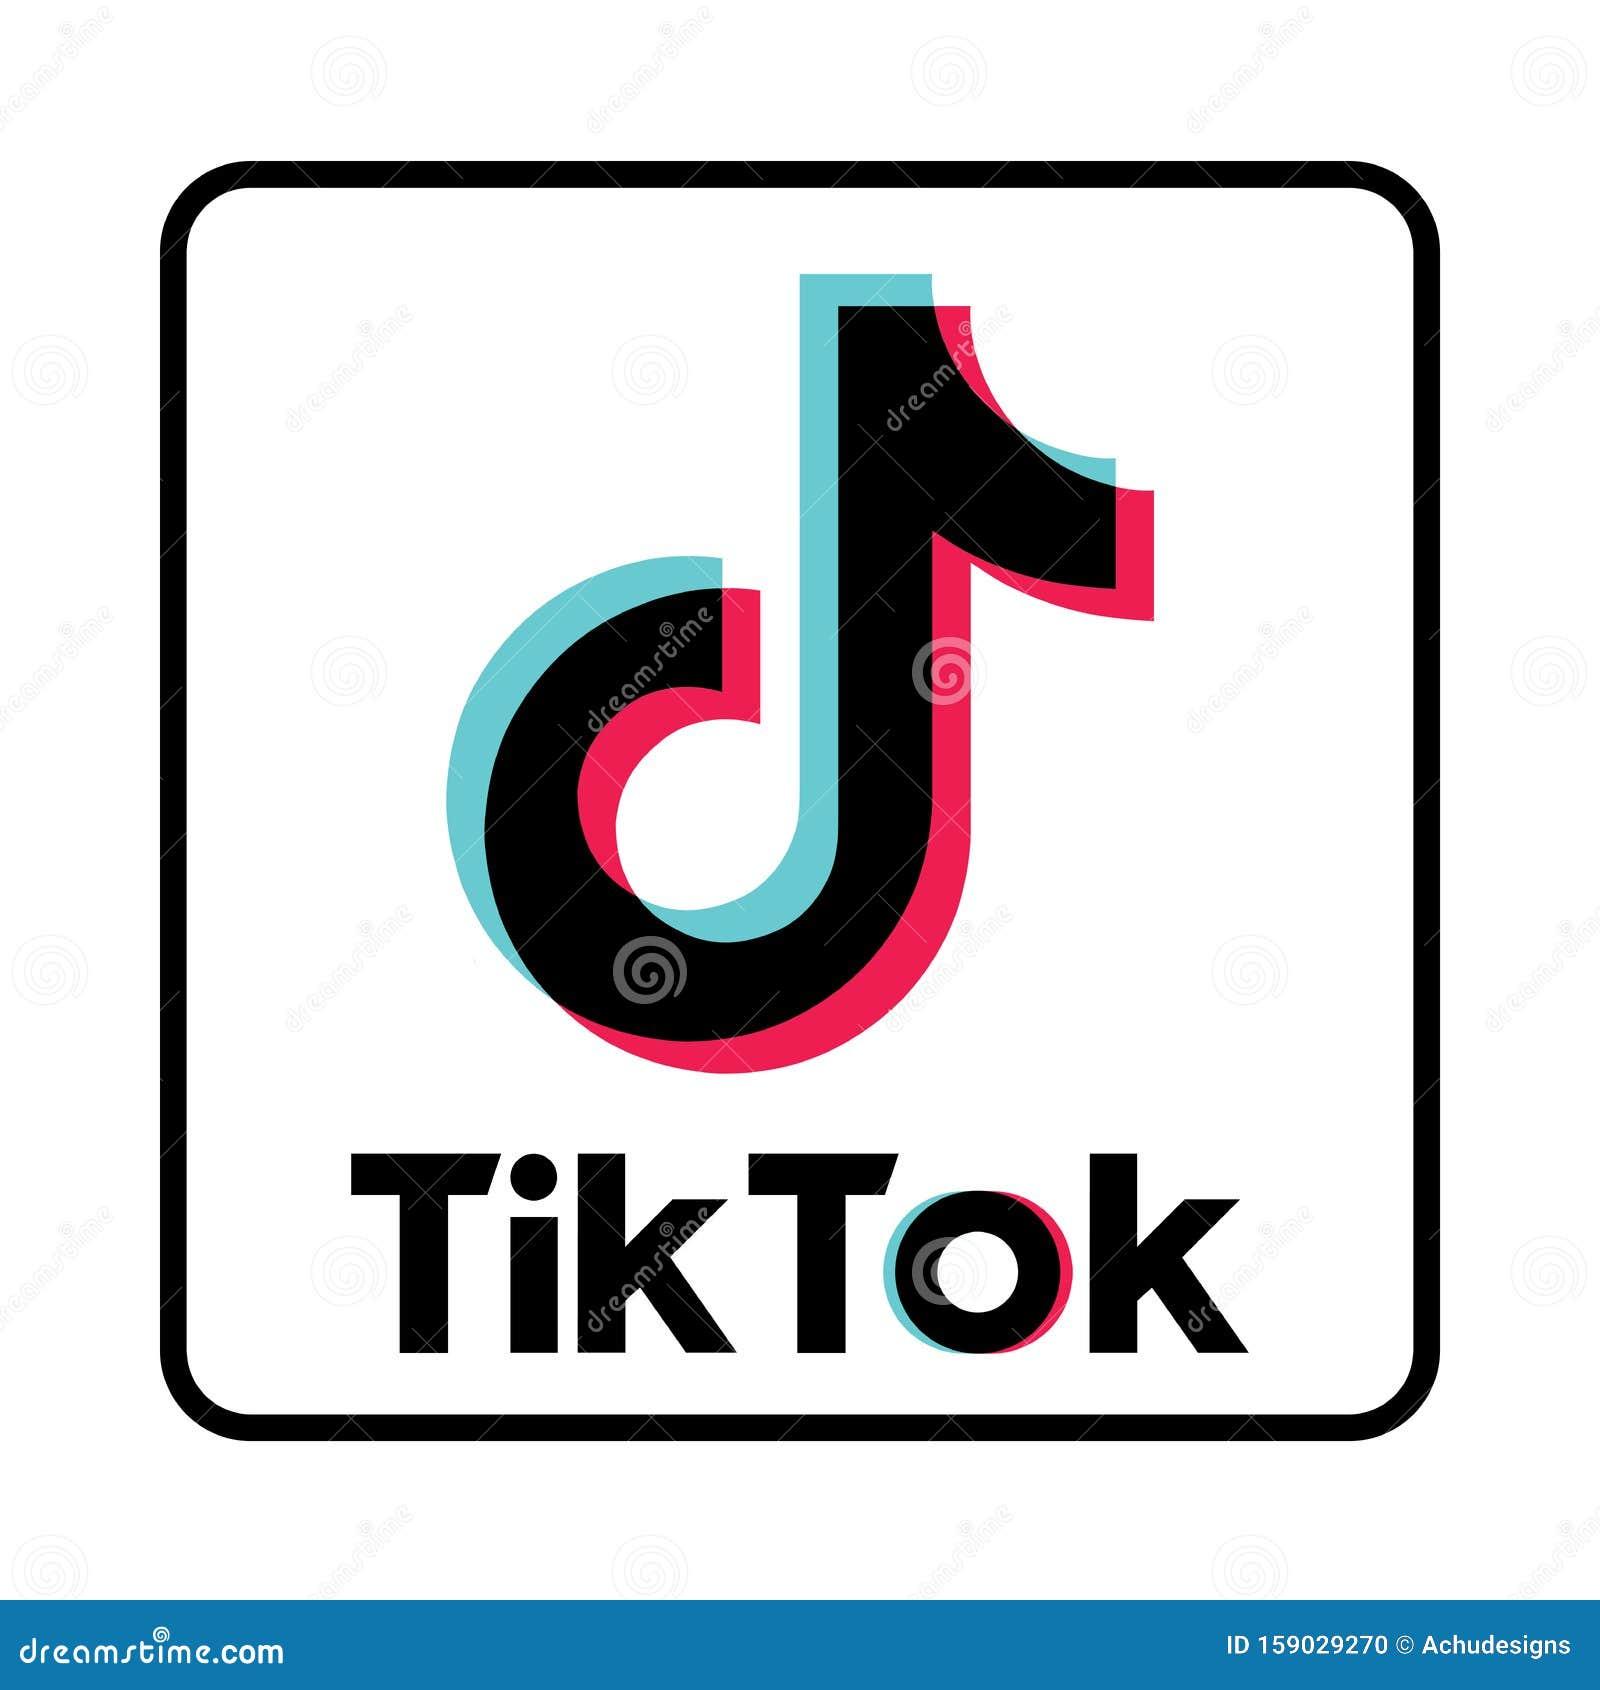 Tiktok Stock Illustrations 485 Tiktok Stock Illustrations Vectors Clipart Dreamstime